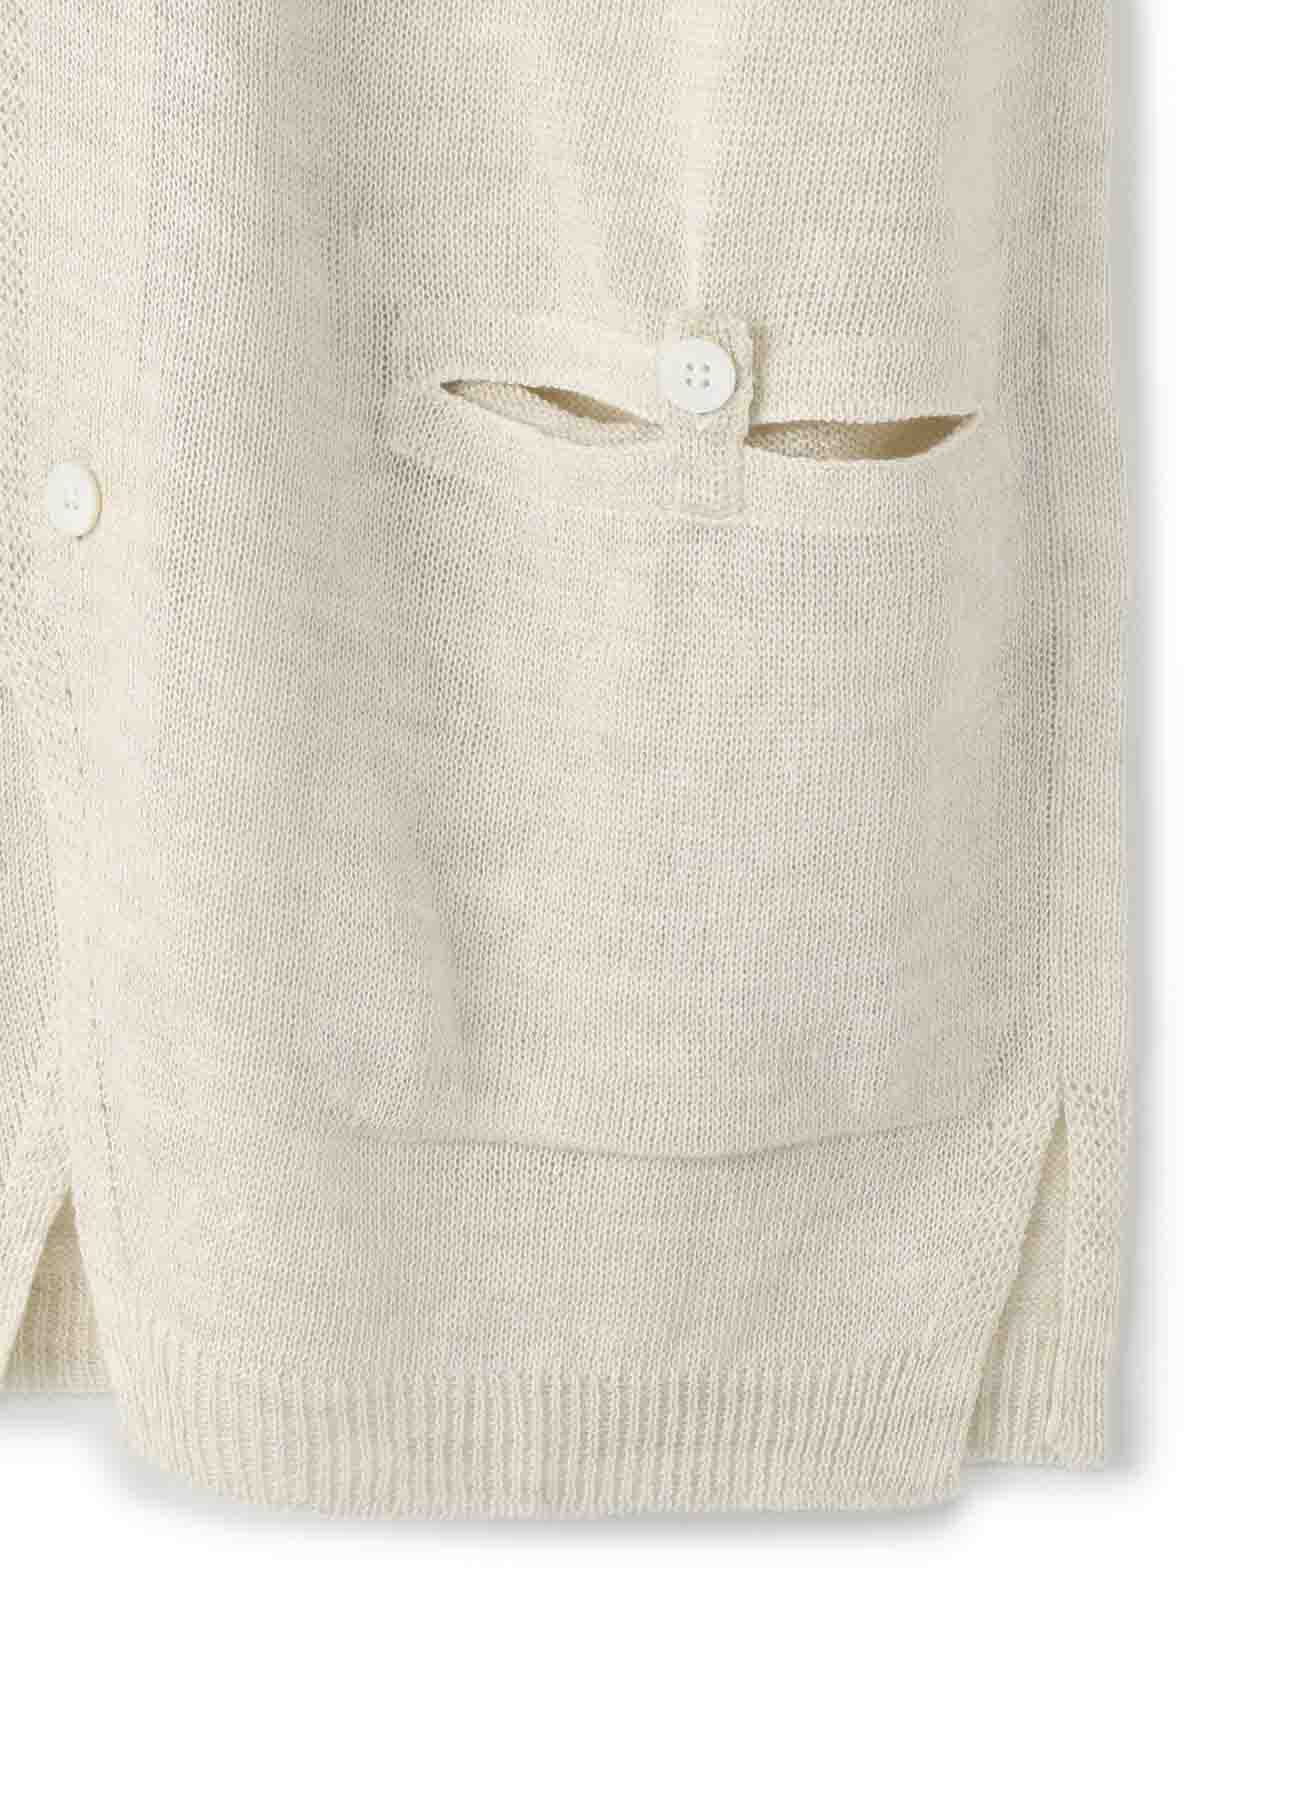 7Gポリエチレン撚糸プレーティング リバーシブルジャケット